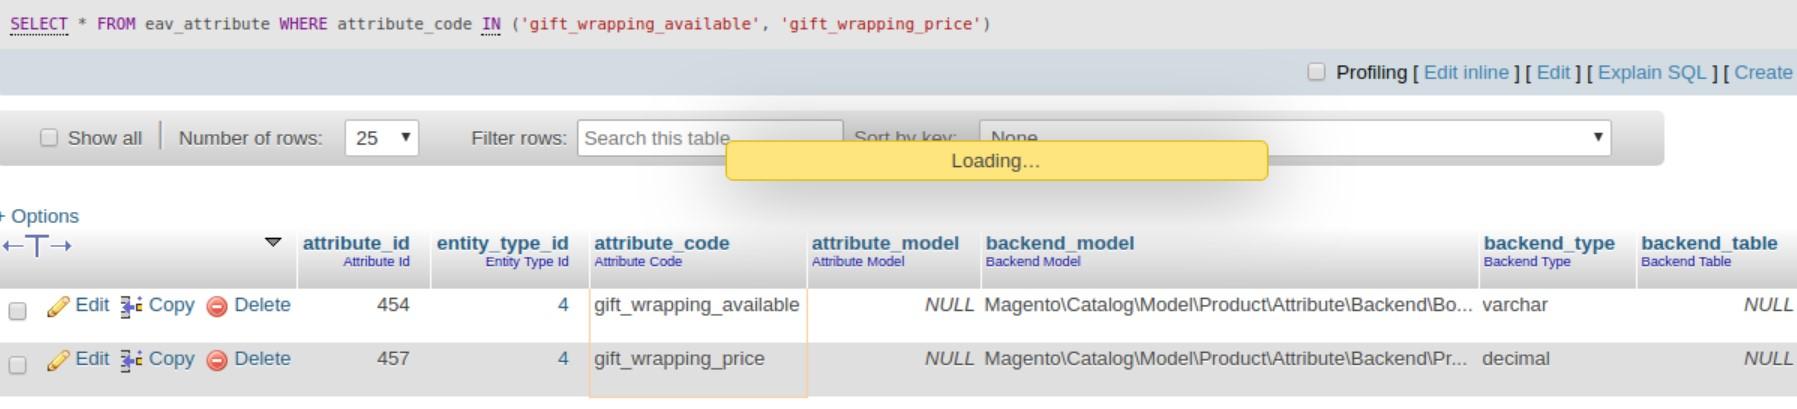 downgrade magento commerce to open source remove attributes